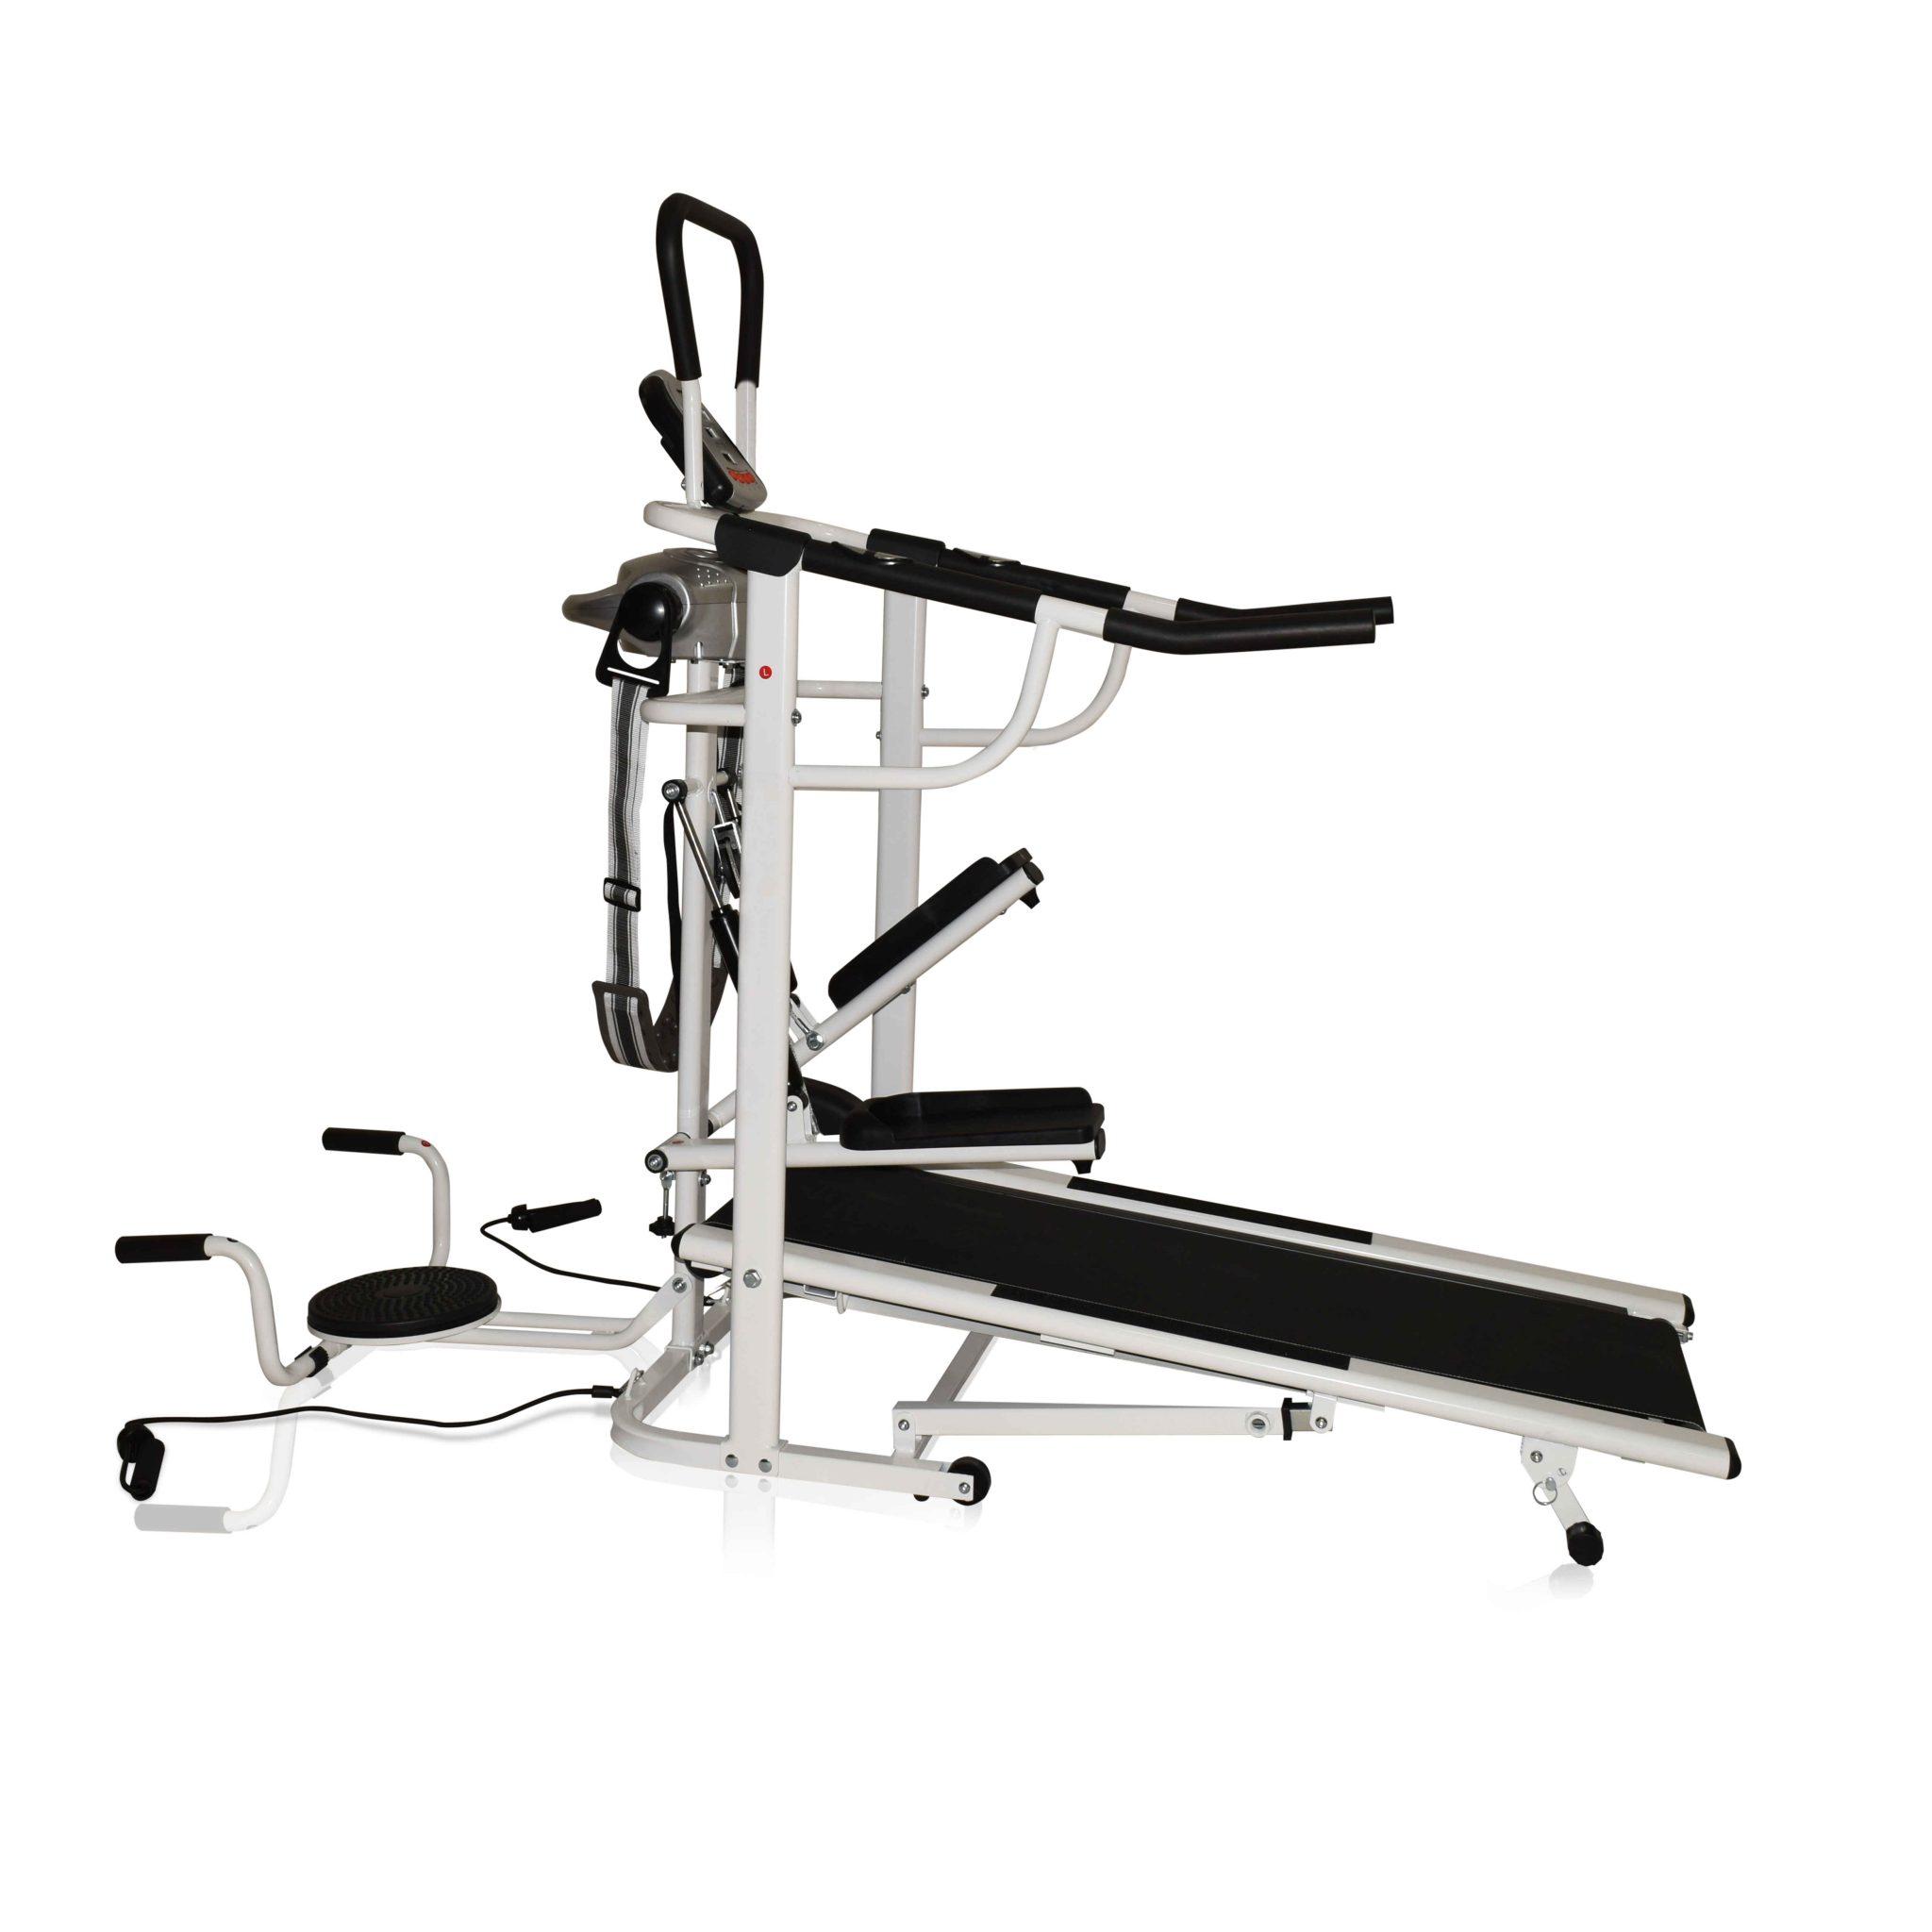 Manual Treadmill OB-2003 Multifungsi Dilengkapi Belt Massager, Twister, Stepper